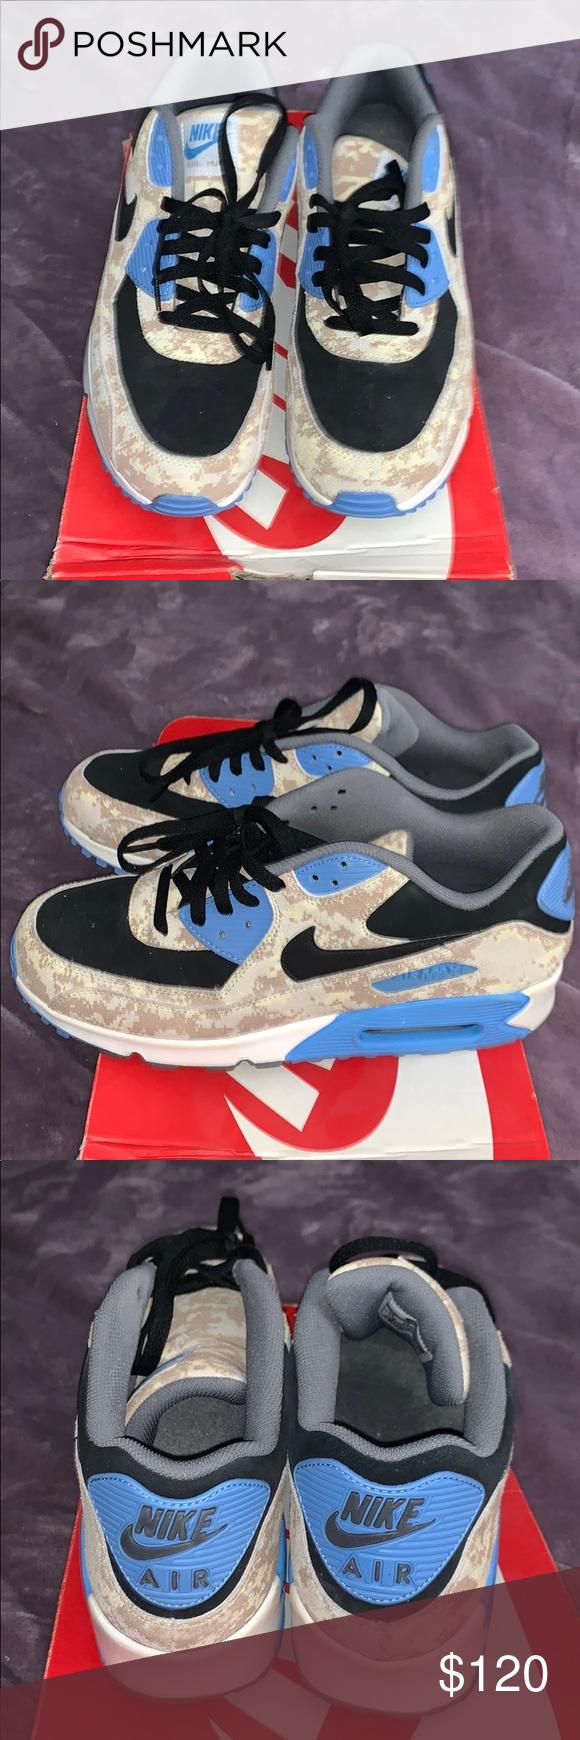 Men's Nike Air Max 90 Digi Camo Released in honor of the Air